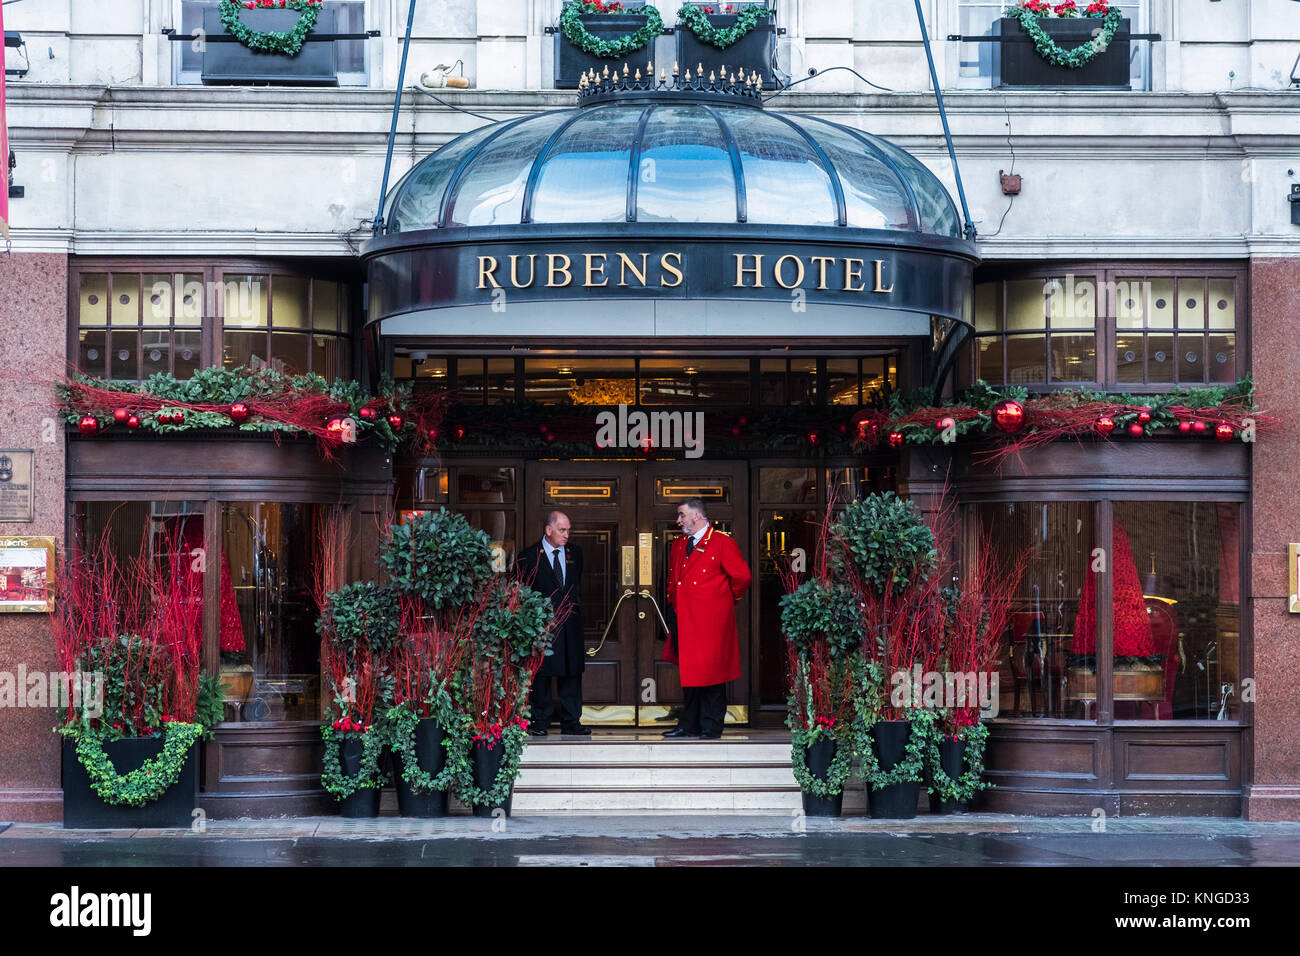 Hotel   Buckingham Palace Road London Email